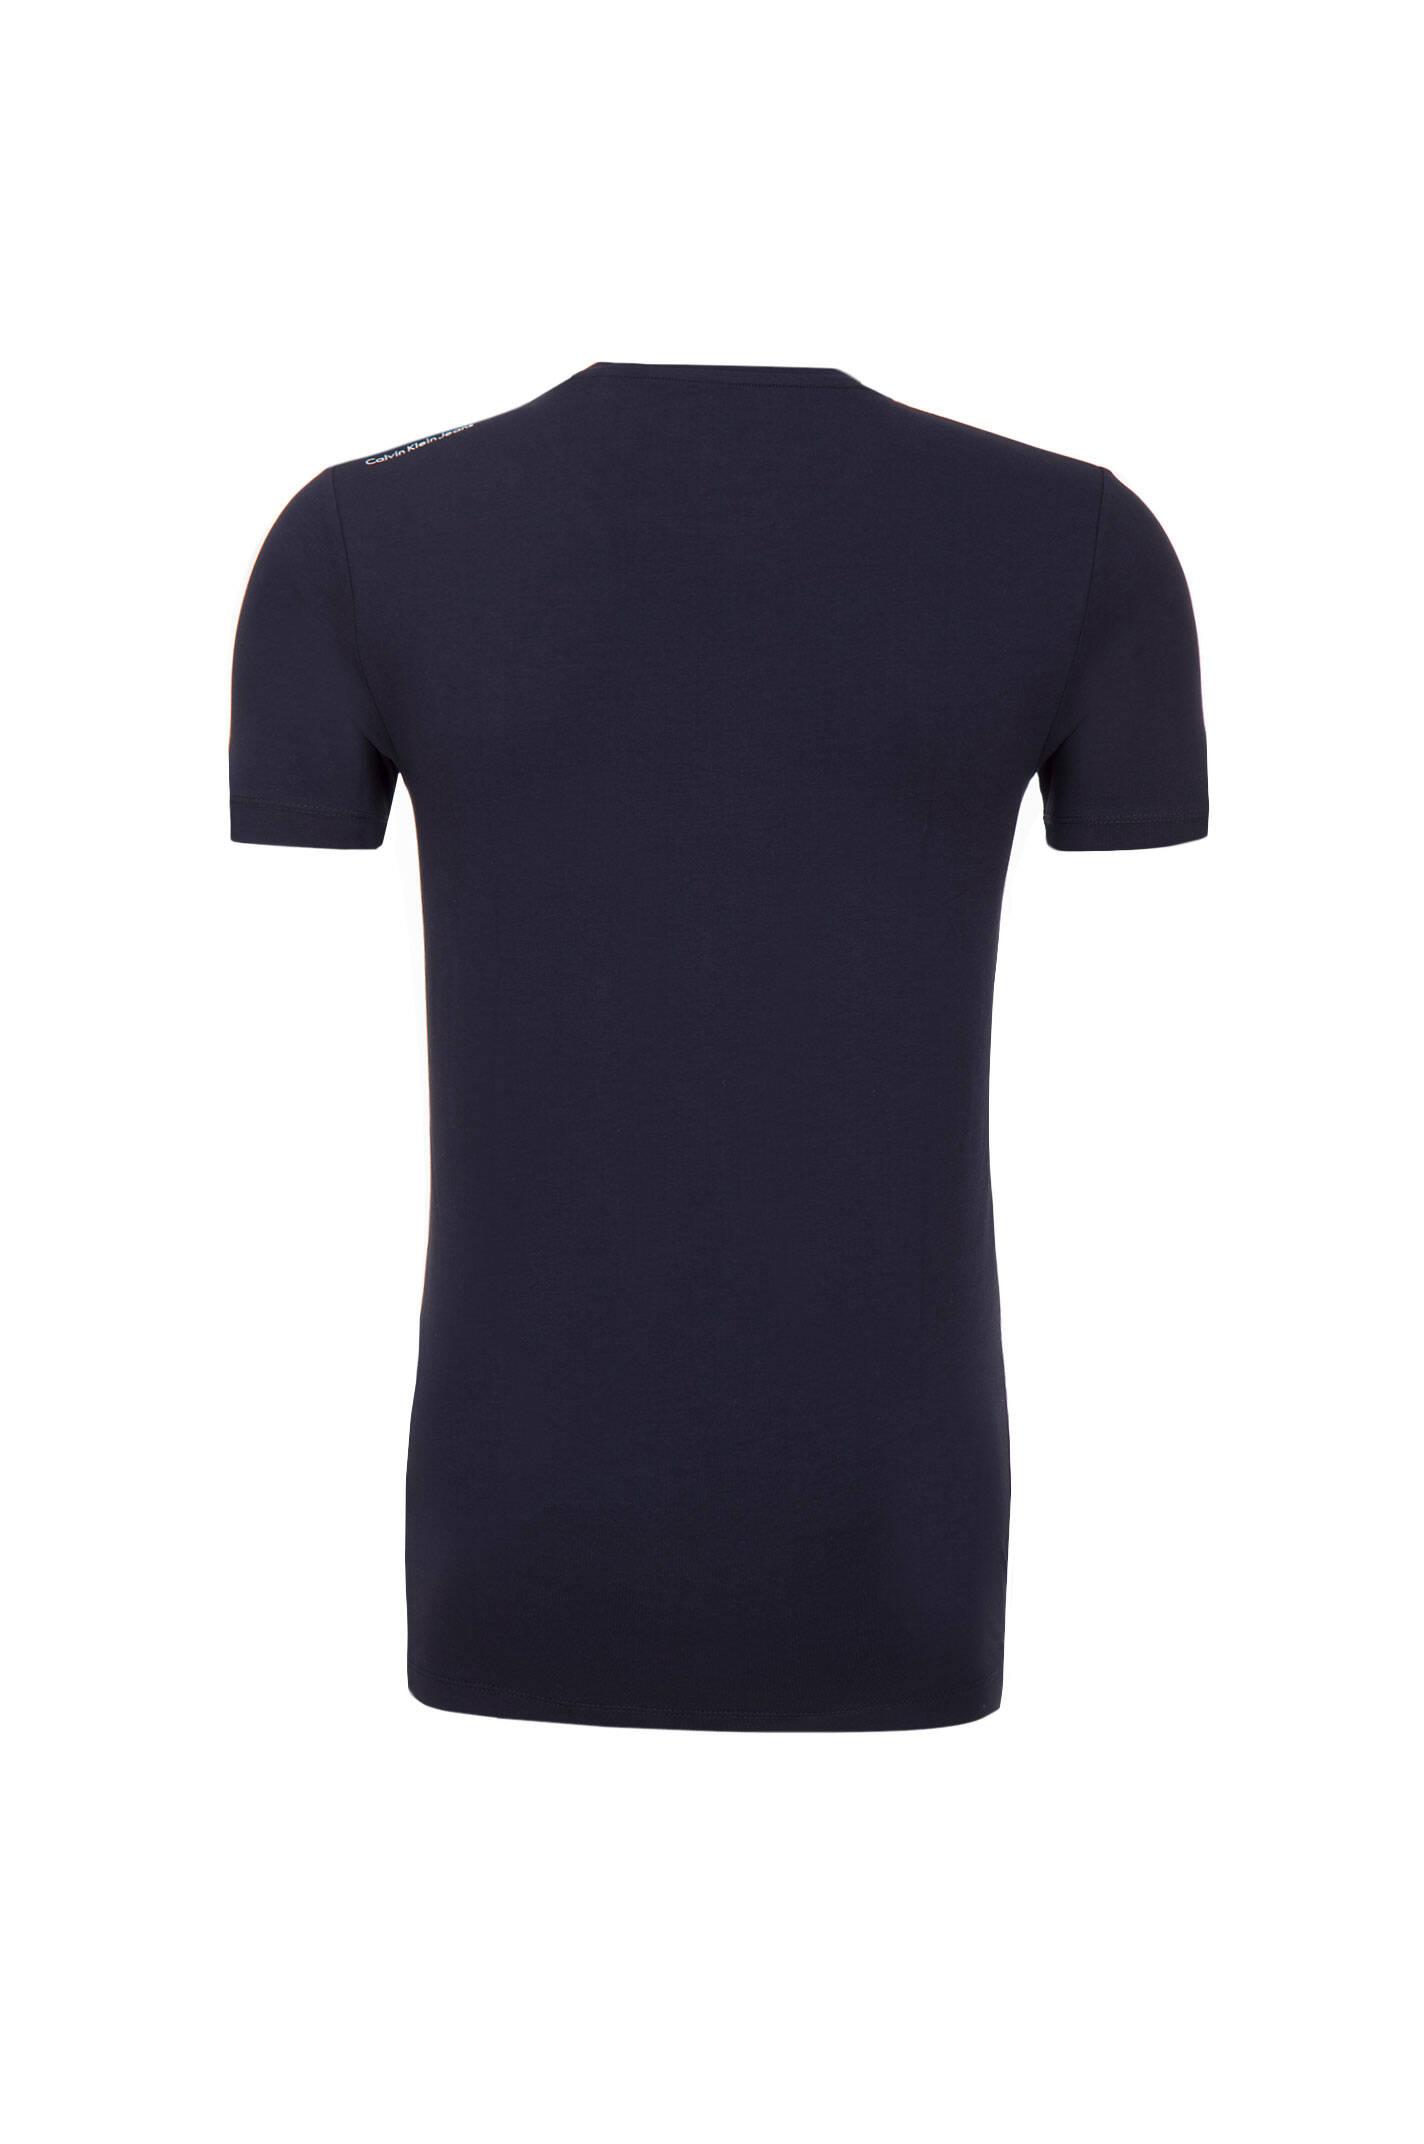 torned t shirt calvin klein jeans navy blue t shirts. Black Bedroom Furniture Sets. Home Design Ideas